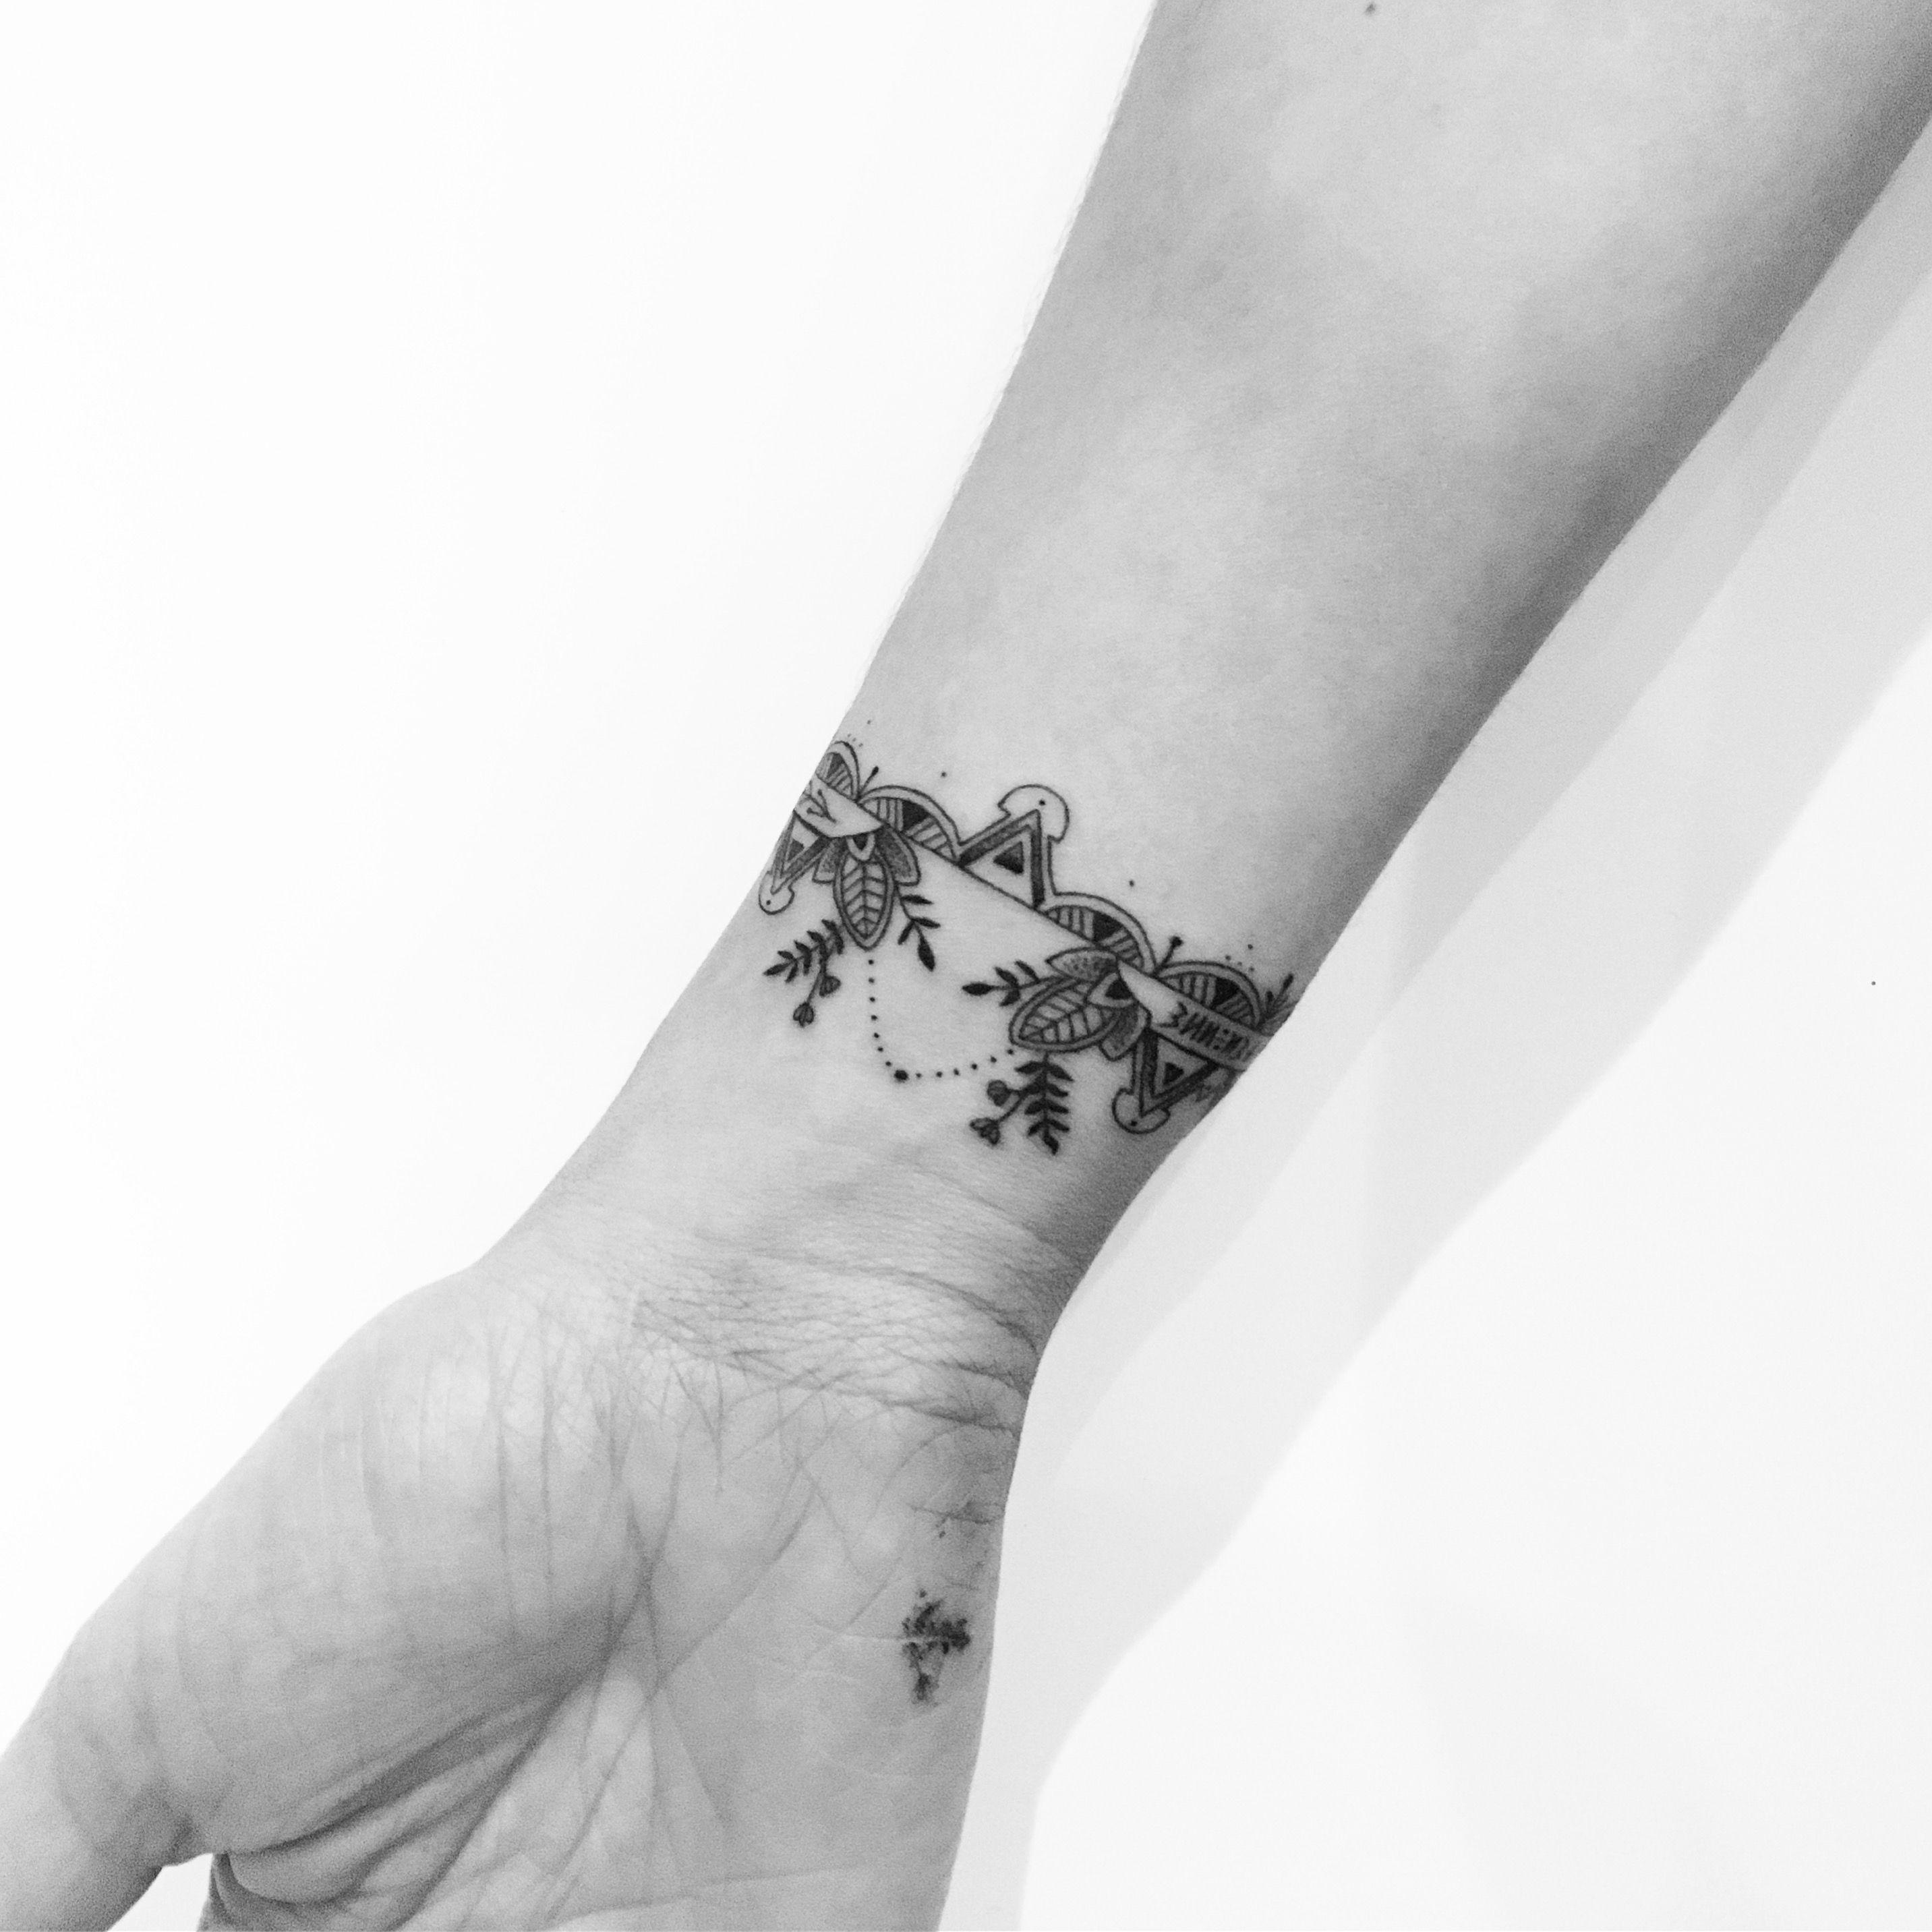 #carinsilverat @lesmauxbleus #mandala #tattoo #fineline #fineliner #fineliner #tats #tattooparis #paris #ink #inked #instaink #inkedlife #instagram #bw #blackwork #blackworkers #blackandwhite #blackworktattoo #instatattoo #instainked #tatouee #tatouage #flowertattoo #lemarais #flowers #fleurs #bracelettattoo #bracelet